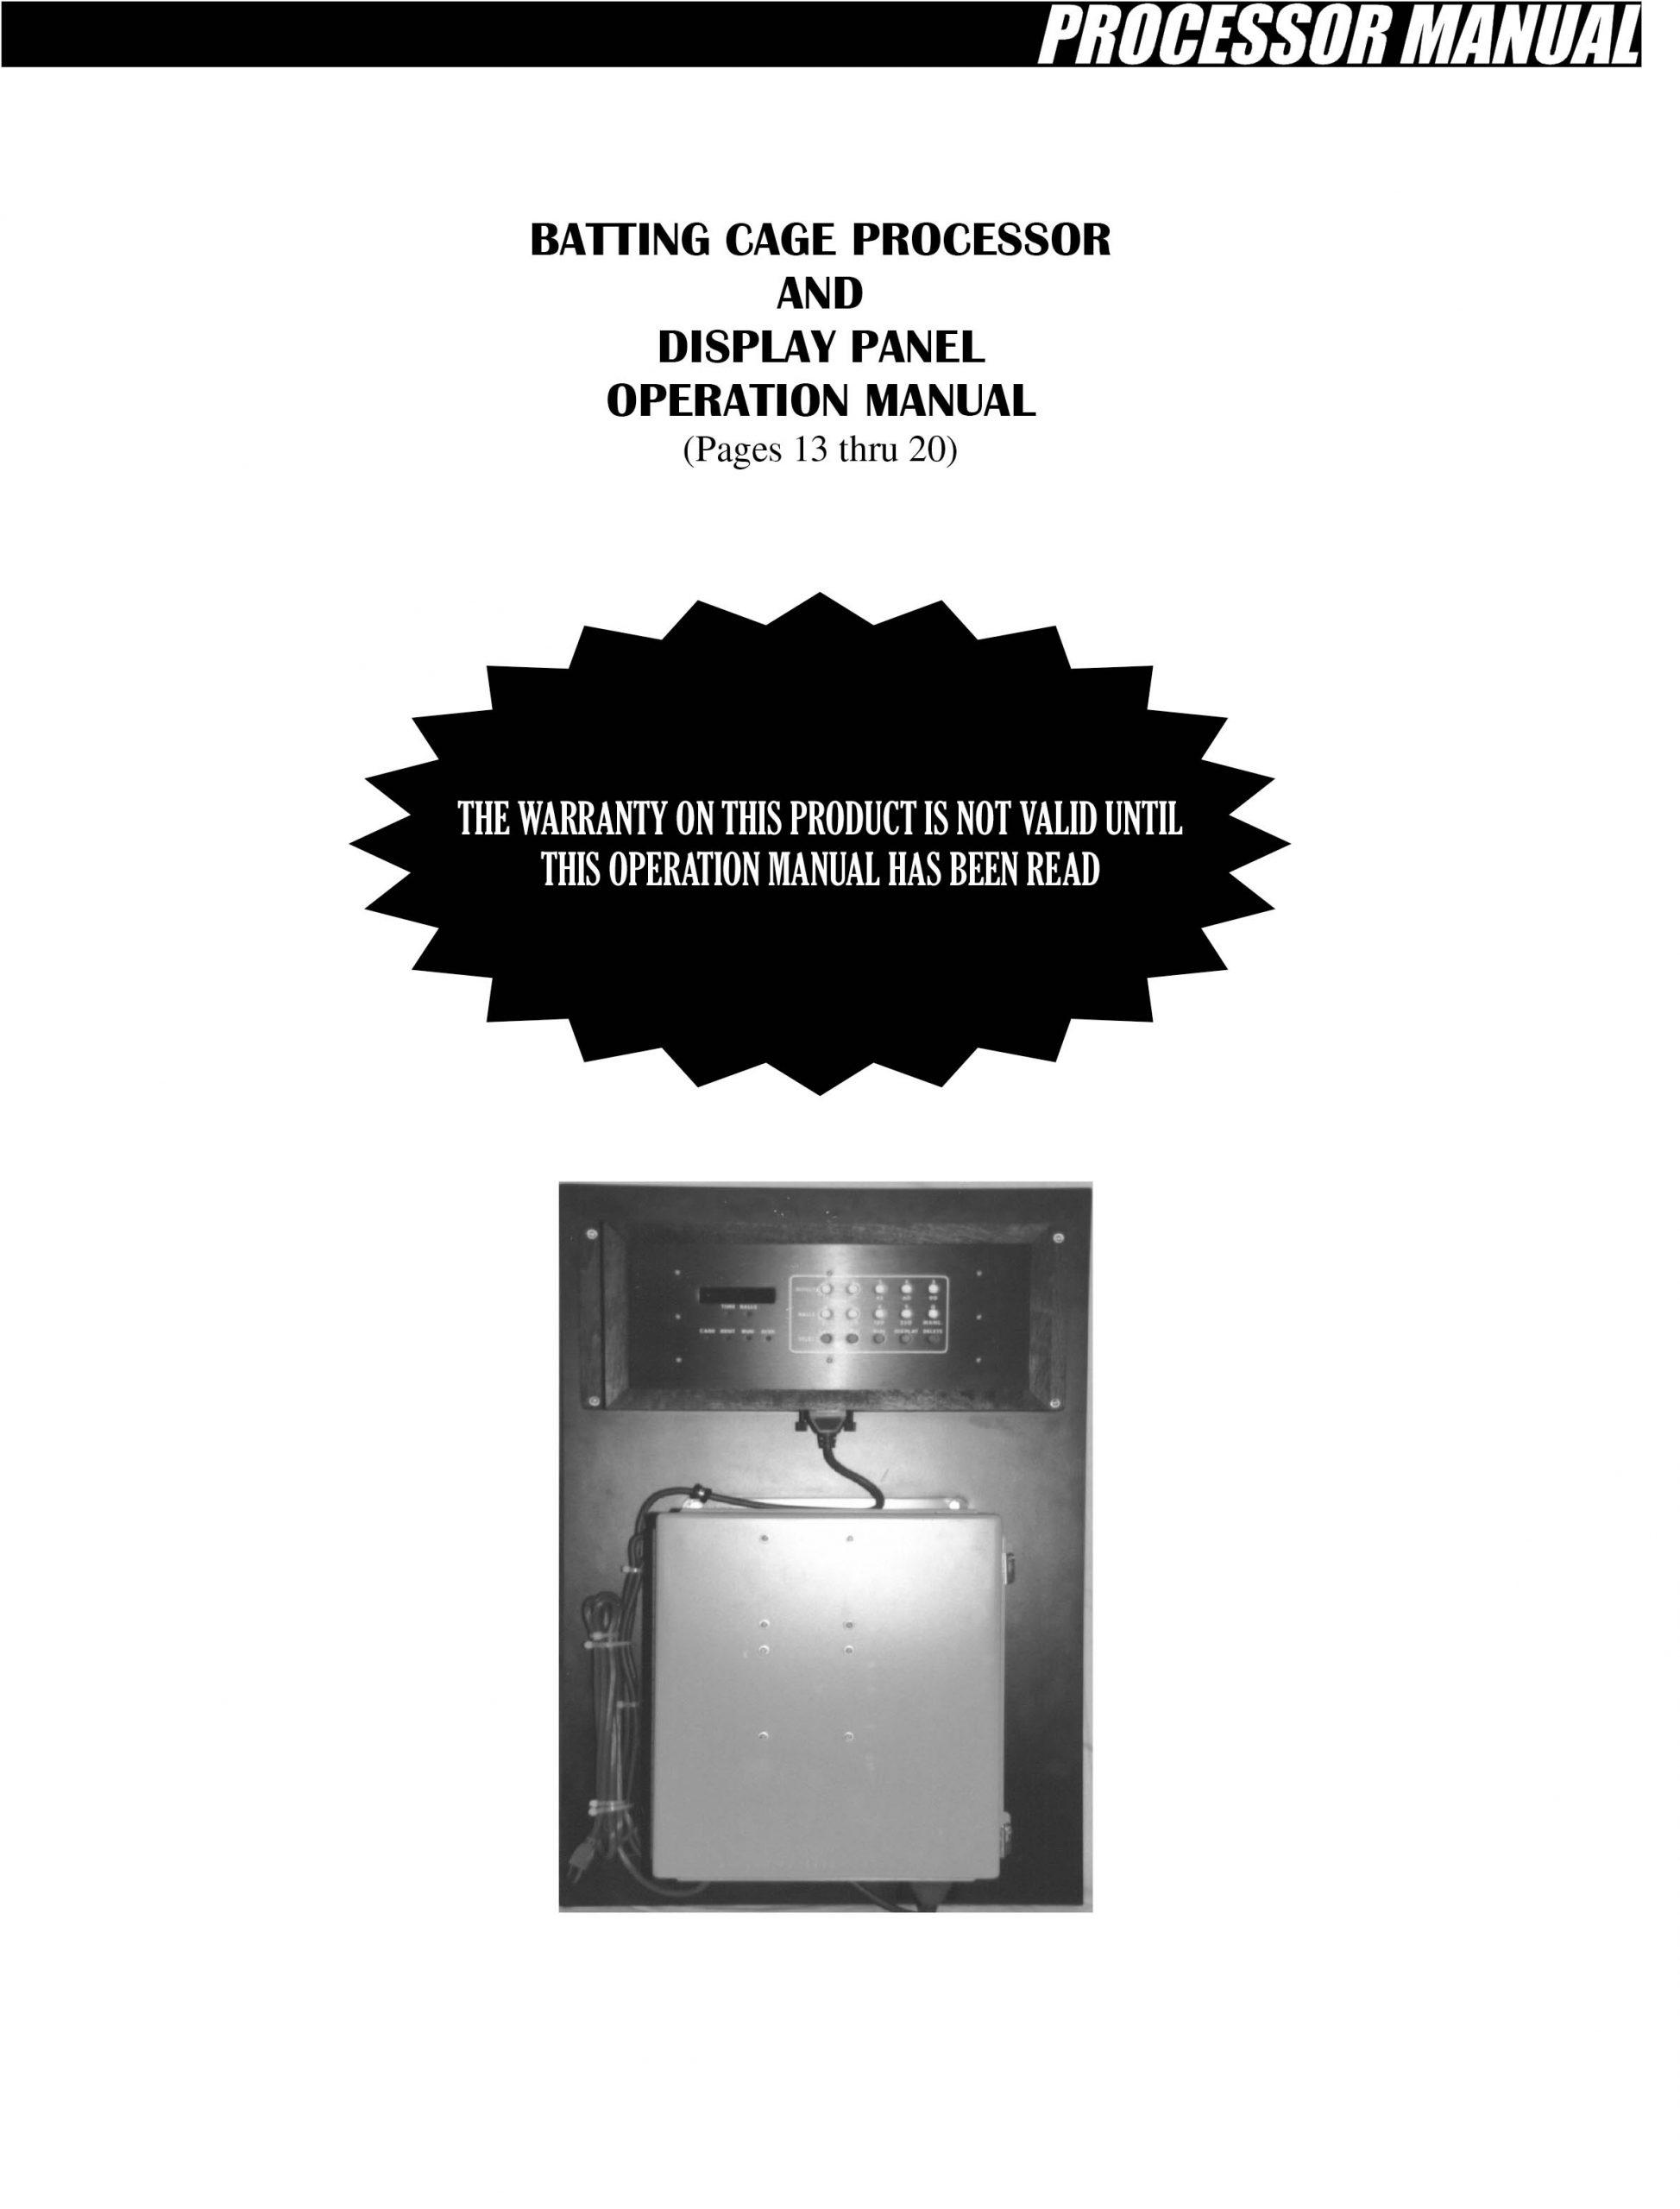 Processor manual